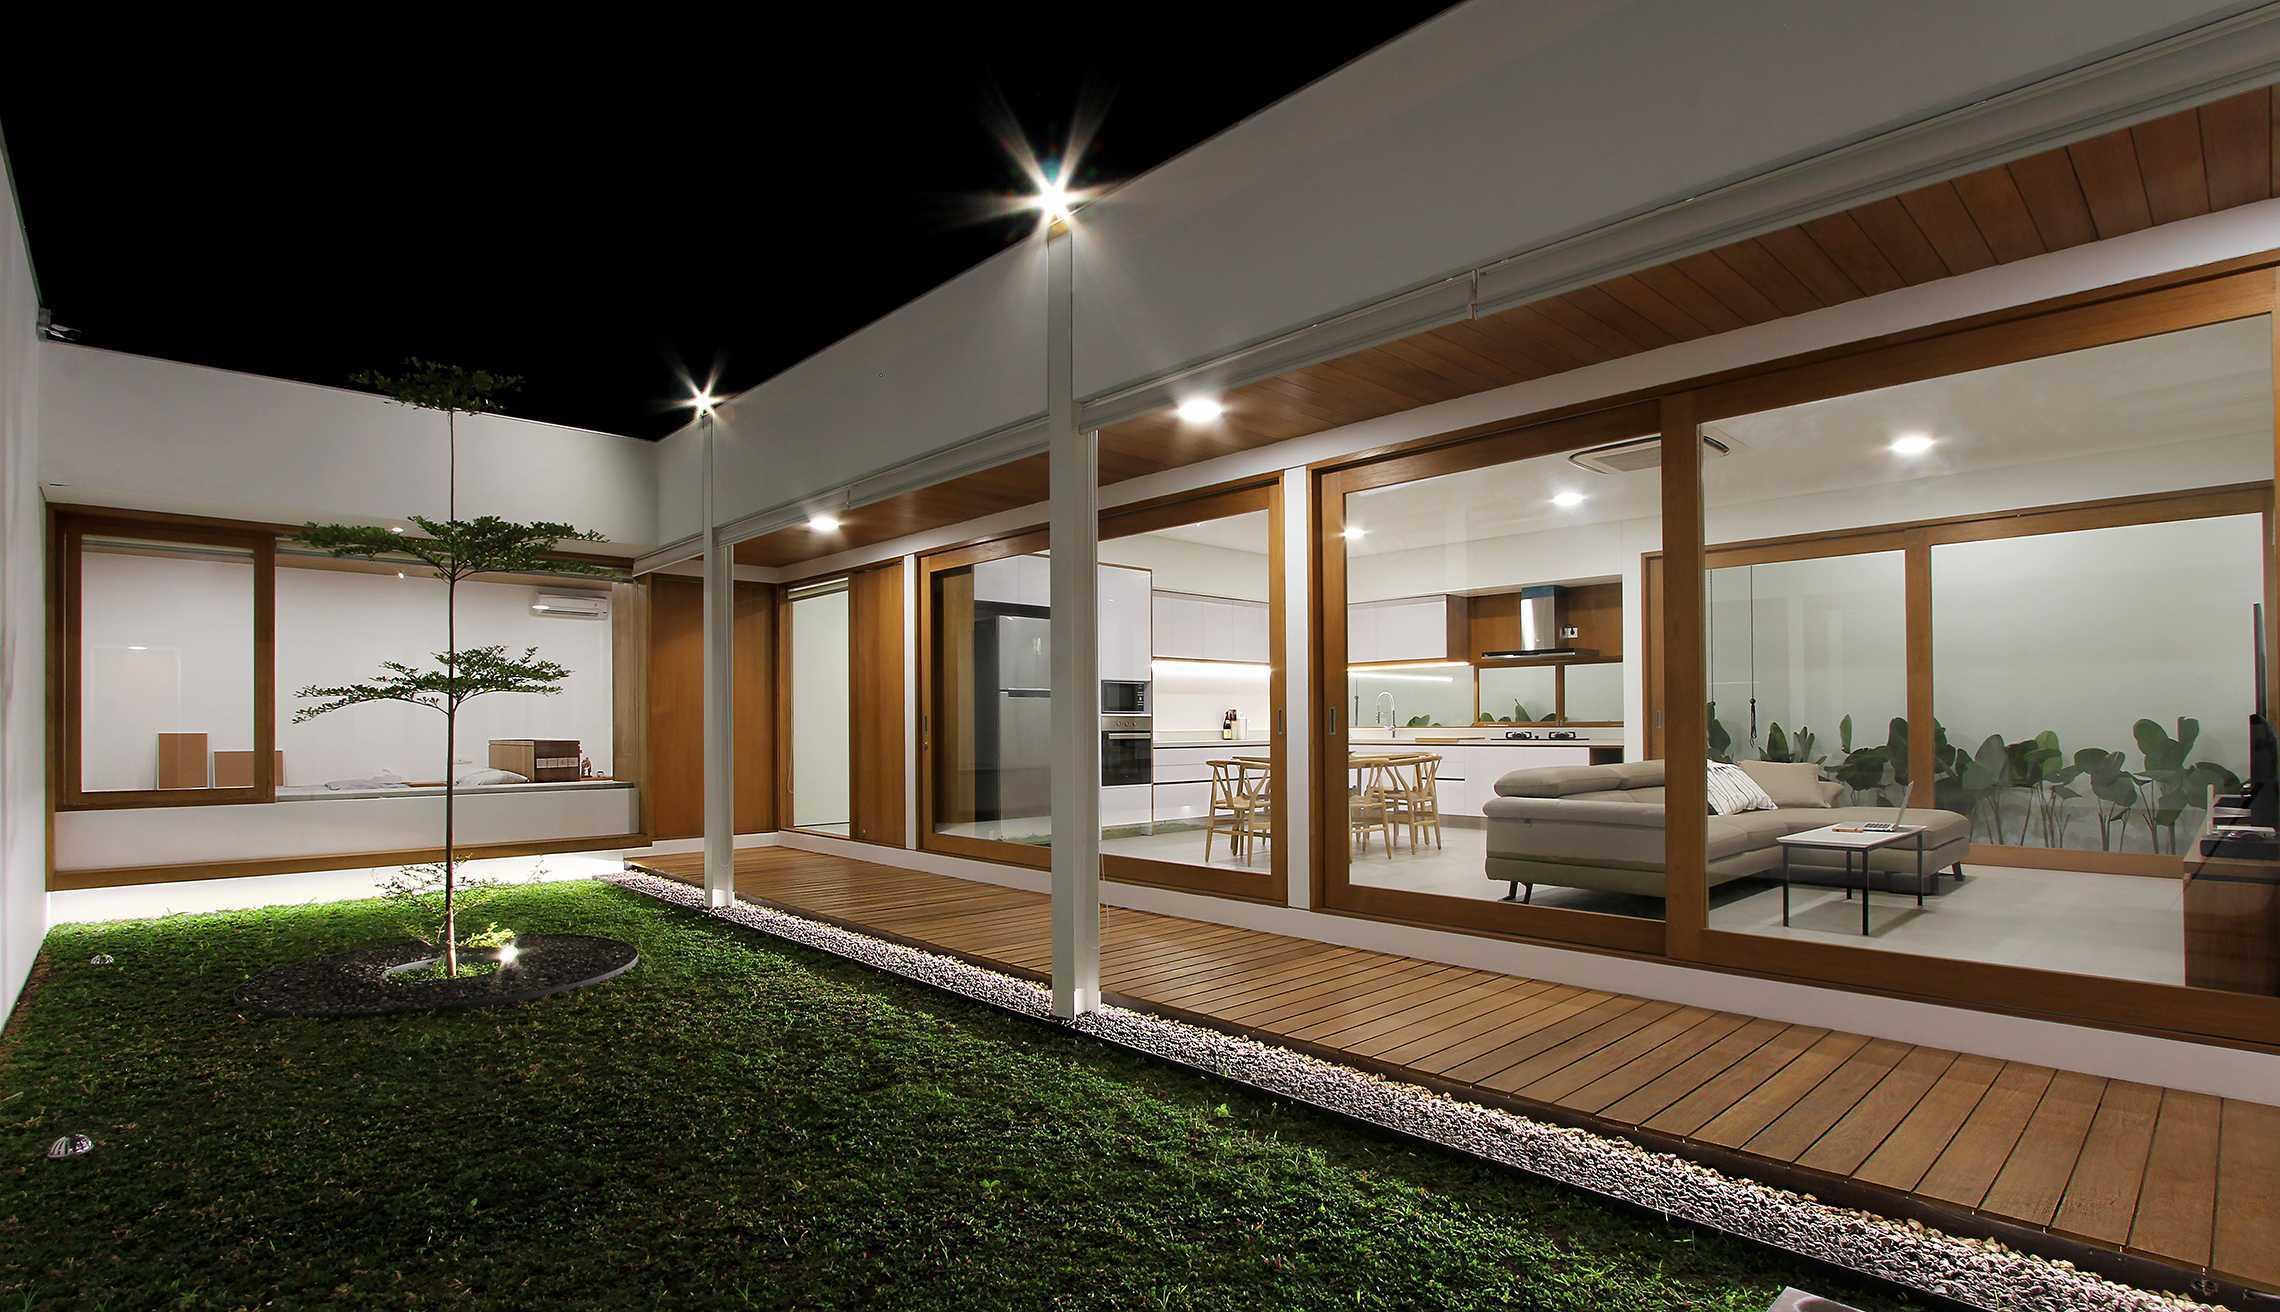 Sasmita Design Studio Penguin House Bandung, Kota Bandung, Jawa Barat, Indonesia Bandung, Kota Bandung, Jawa Barat, Indonesia William-Sasmita-Penguin-House   91183